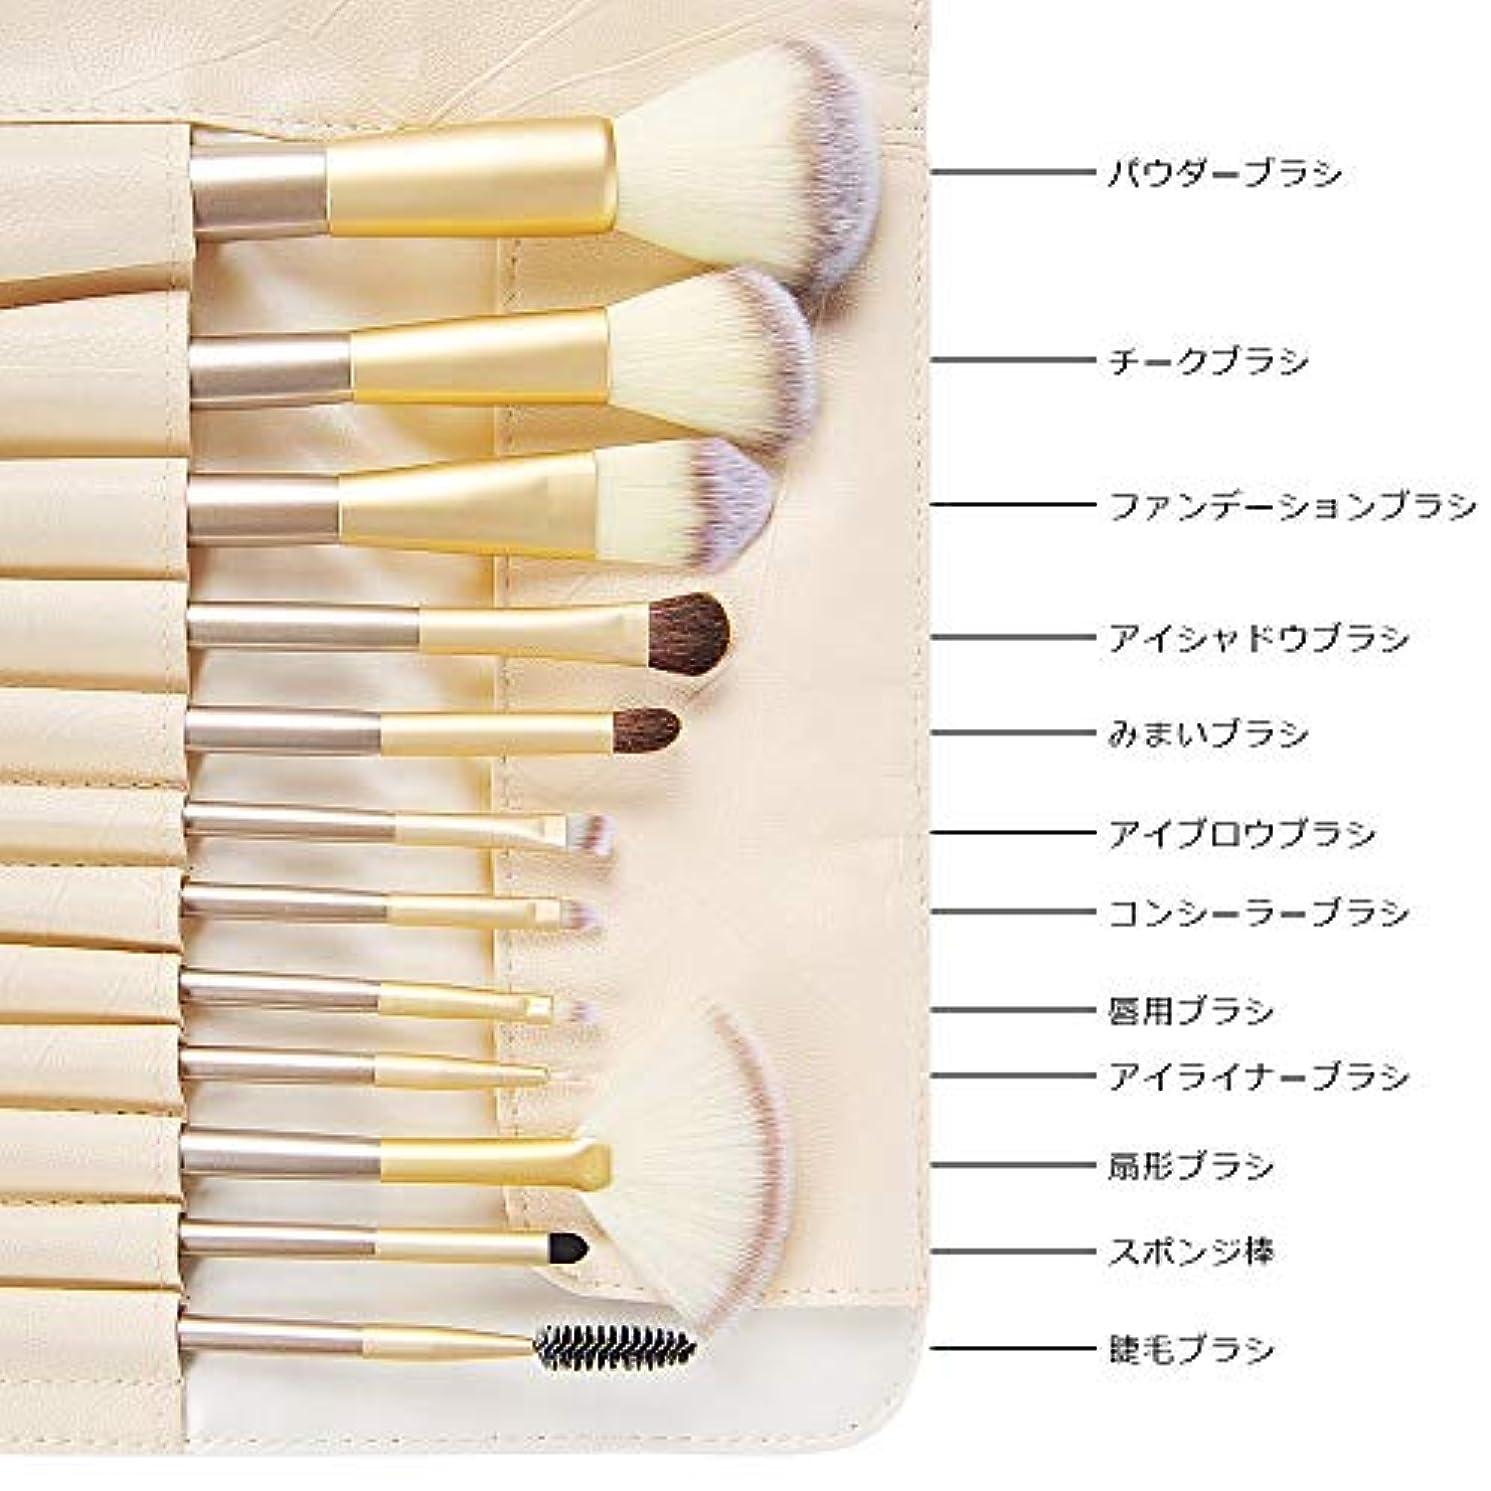 Acavado メイクブラシ 12本セット 人気化粧筆 超柔らかい 高品質PUレザー化粧ポーチ付き メイクデビュー Acavado